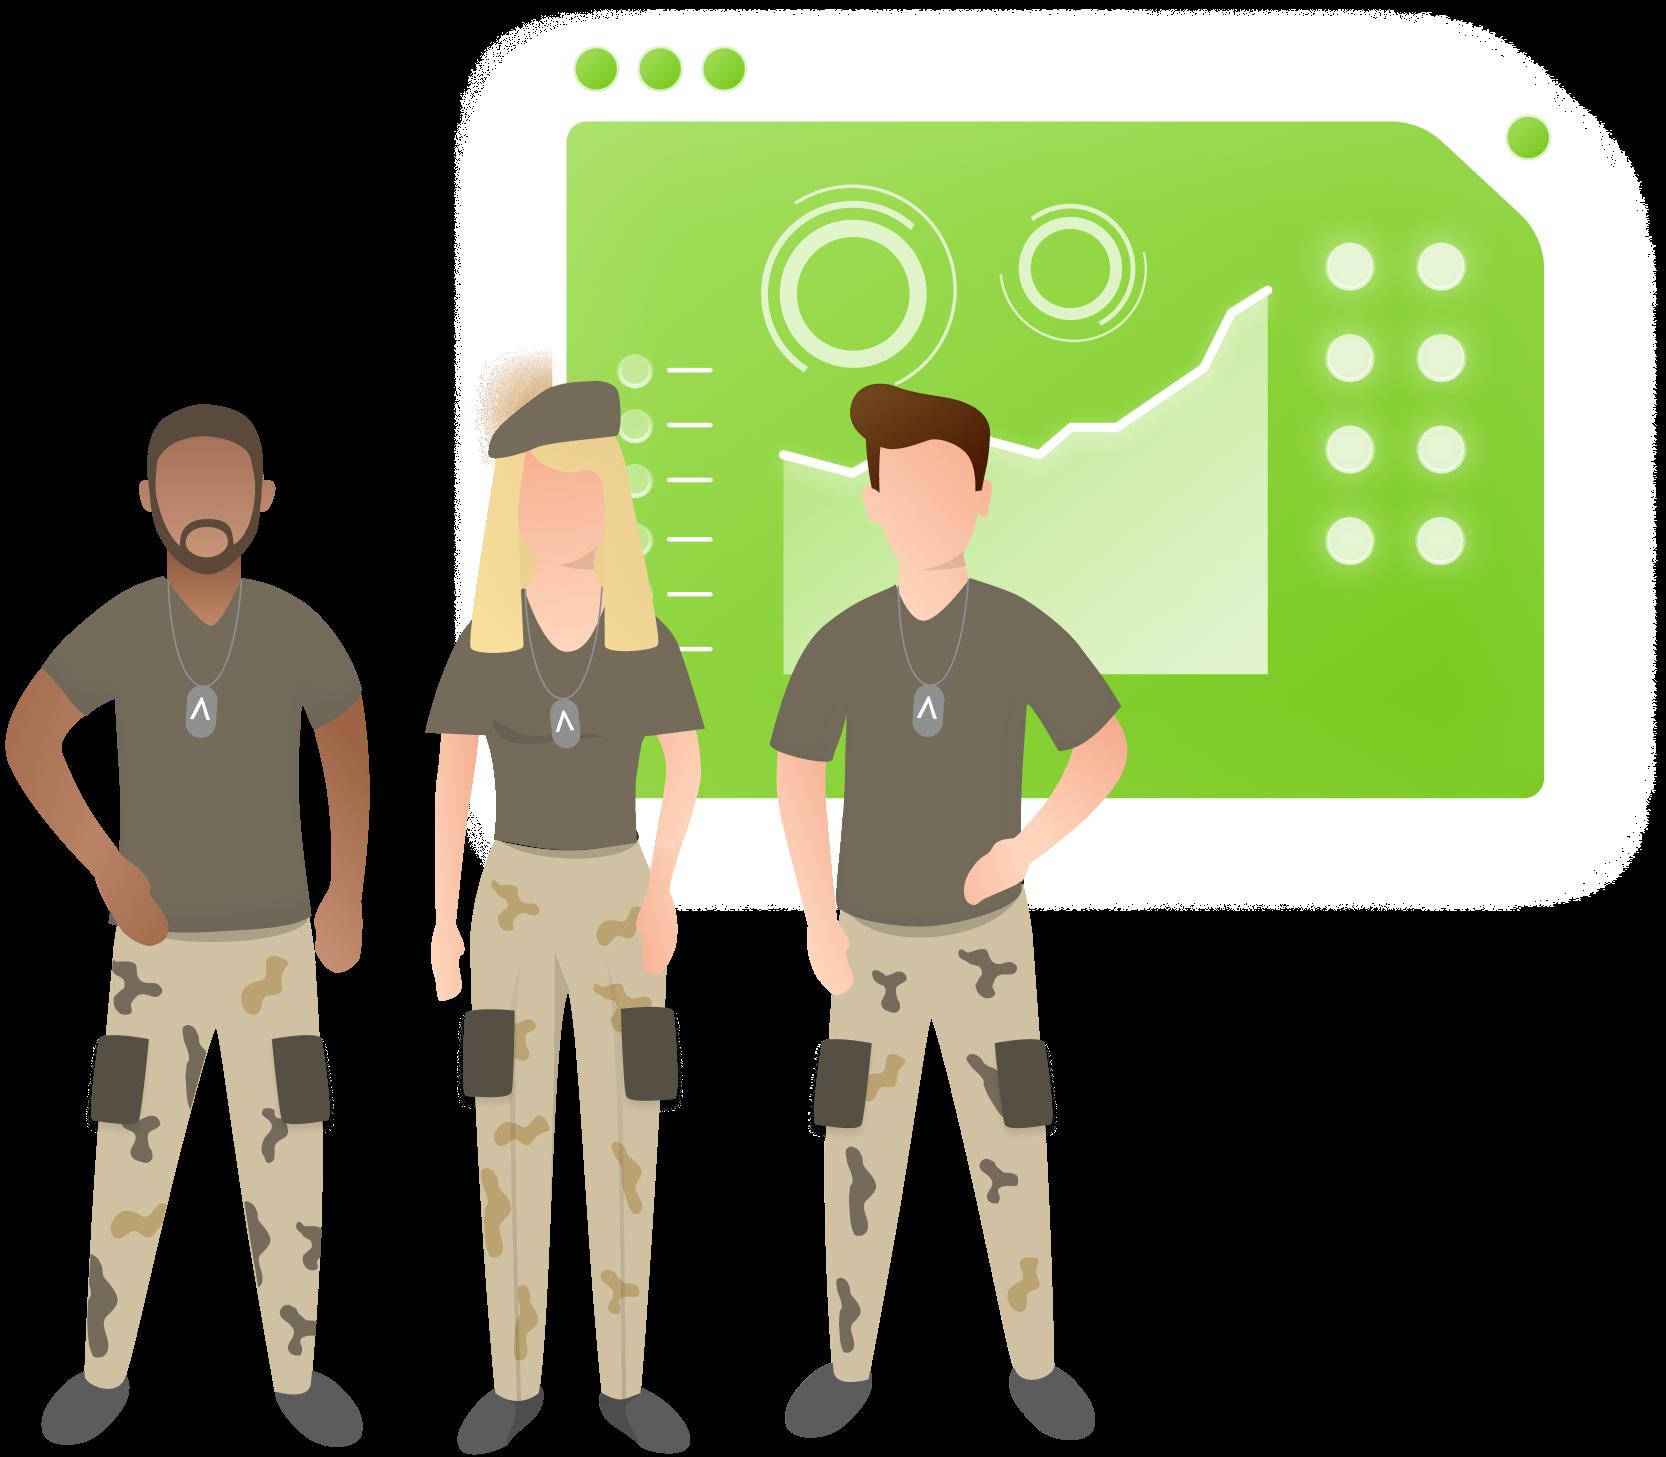 army illustrartion